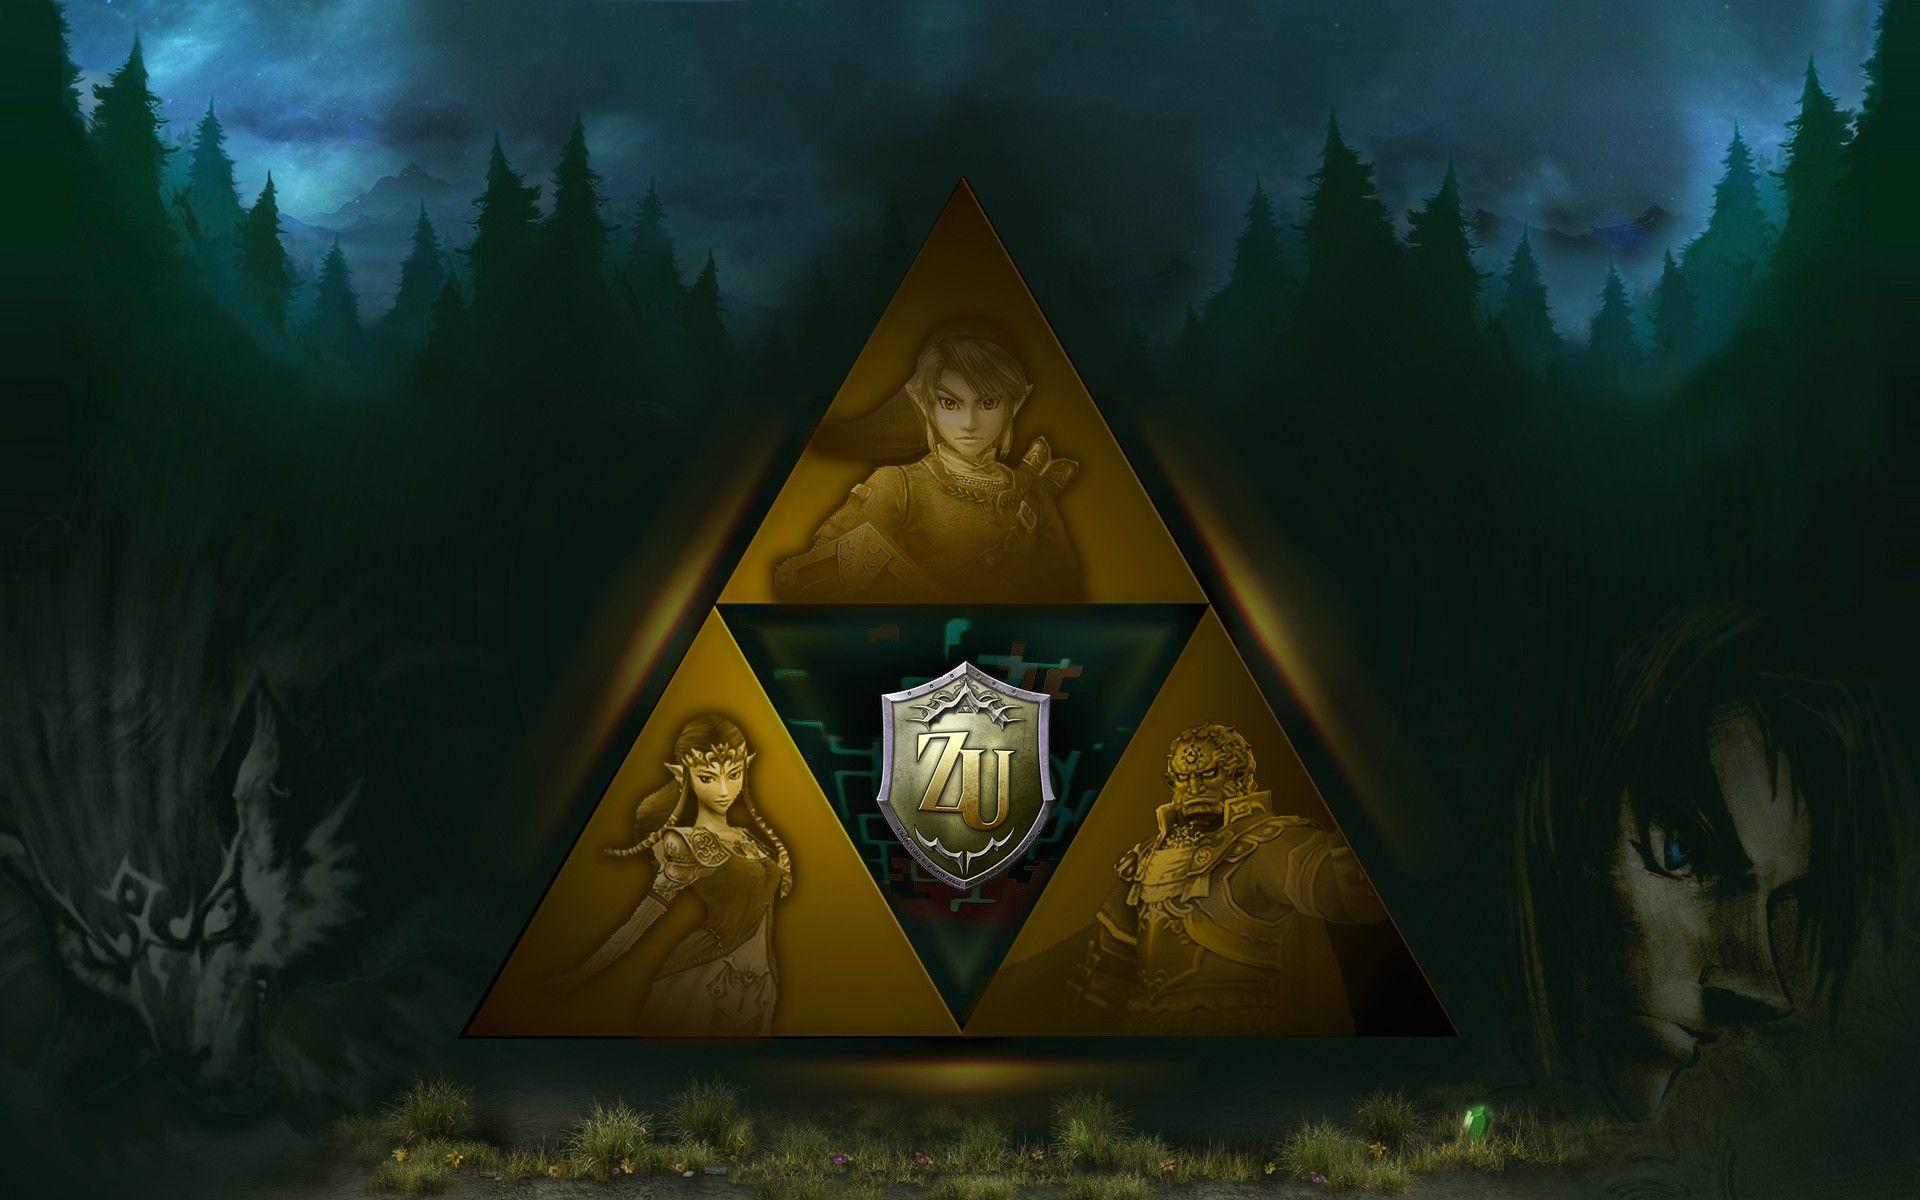 Video Game Zelda Princess Triforce Link Ganondorf Wallpaper